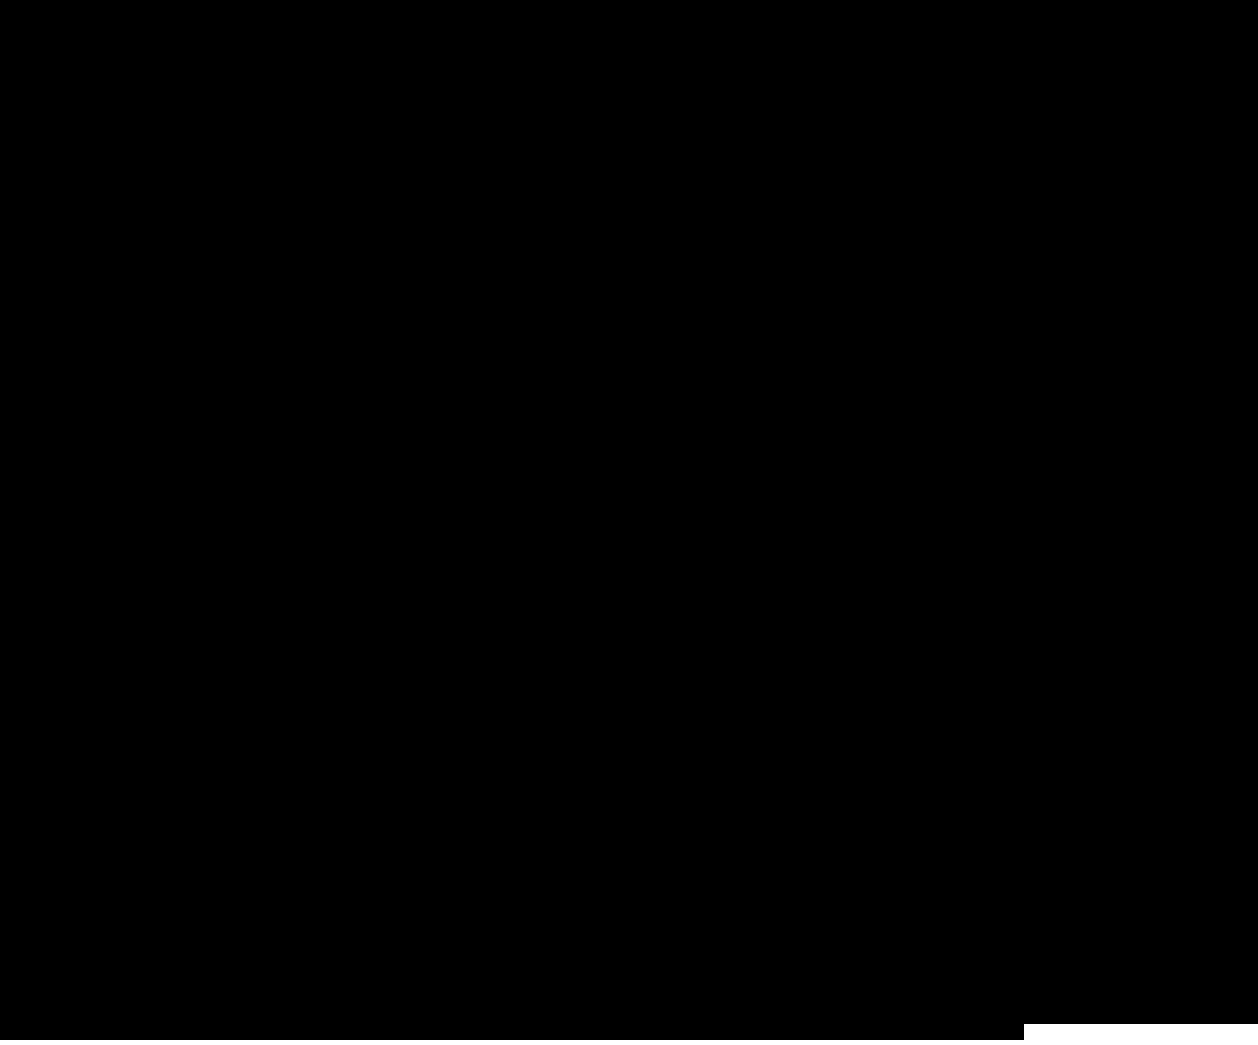 logo minimal Tannerie Sovos